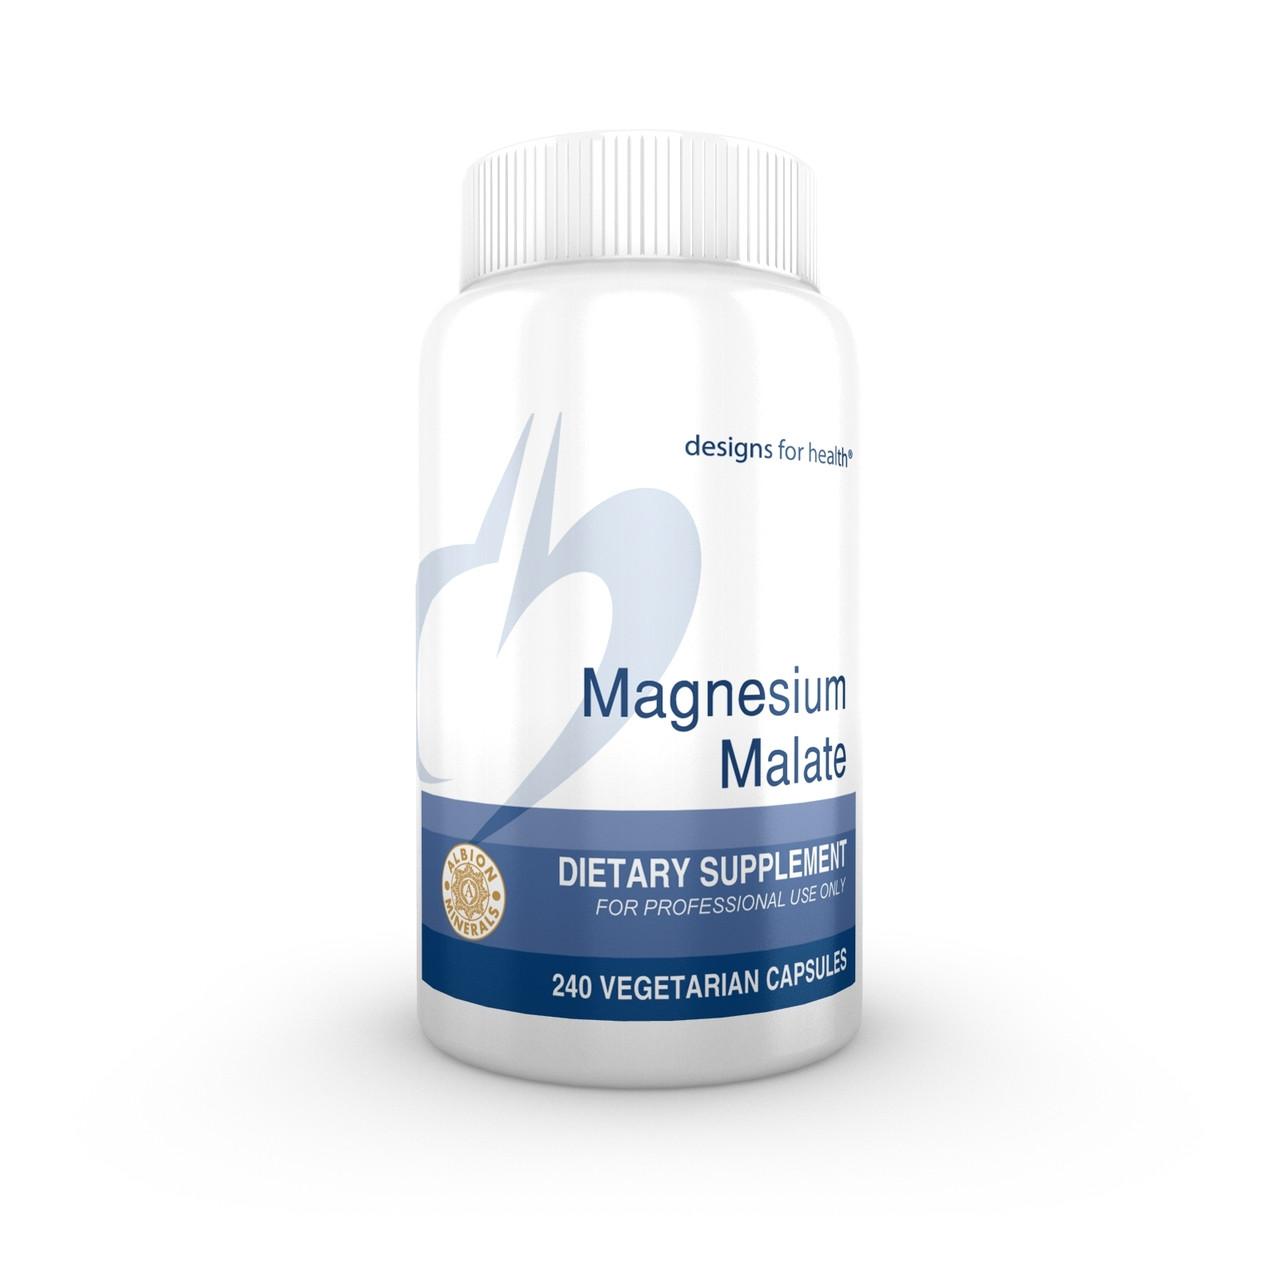 Designs For Health Magnesium Malate 240 veg caps